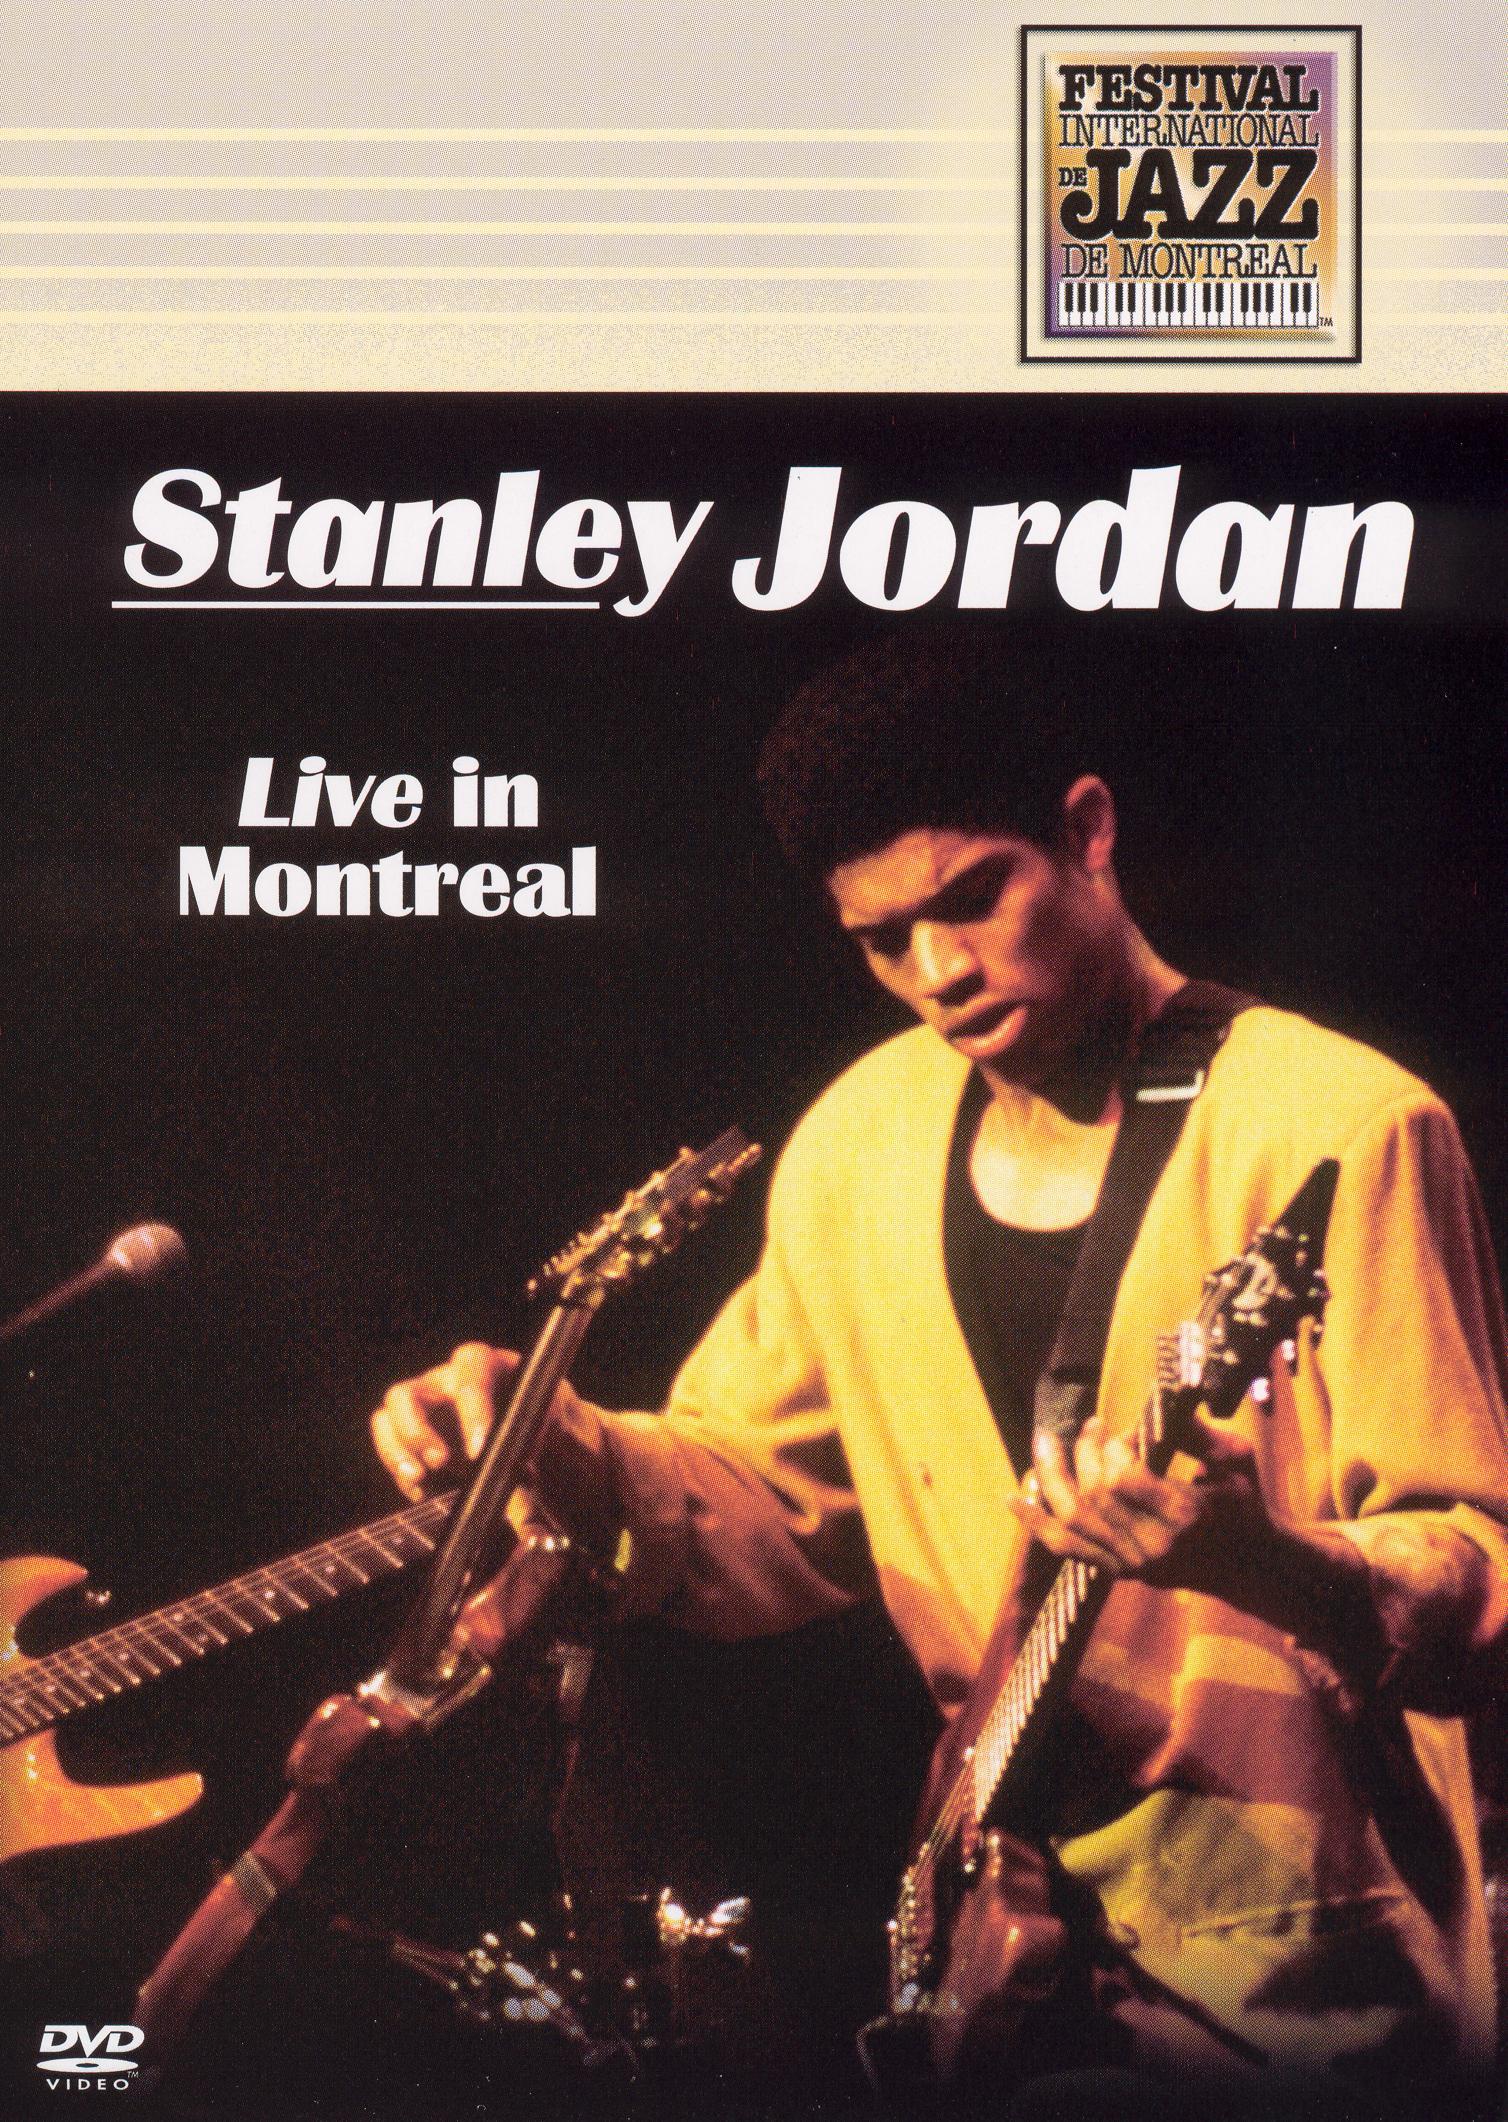 Stanley Jordan: Live in Montreal